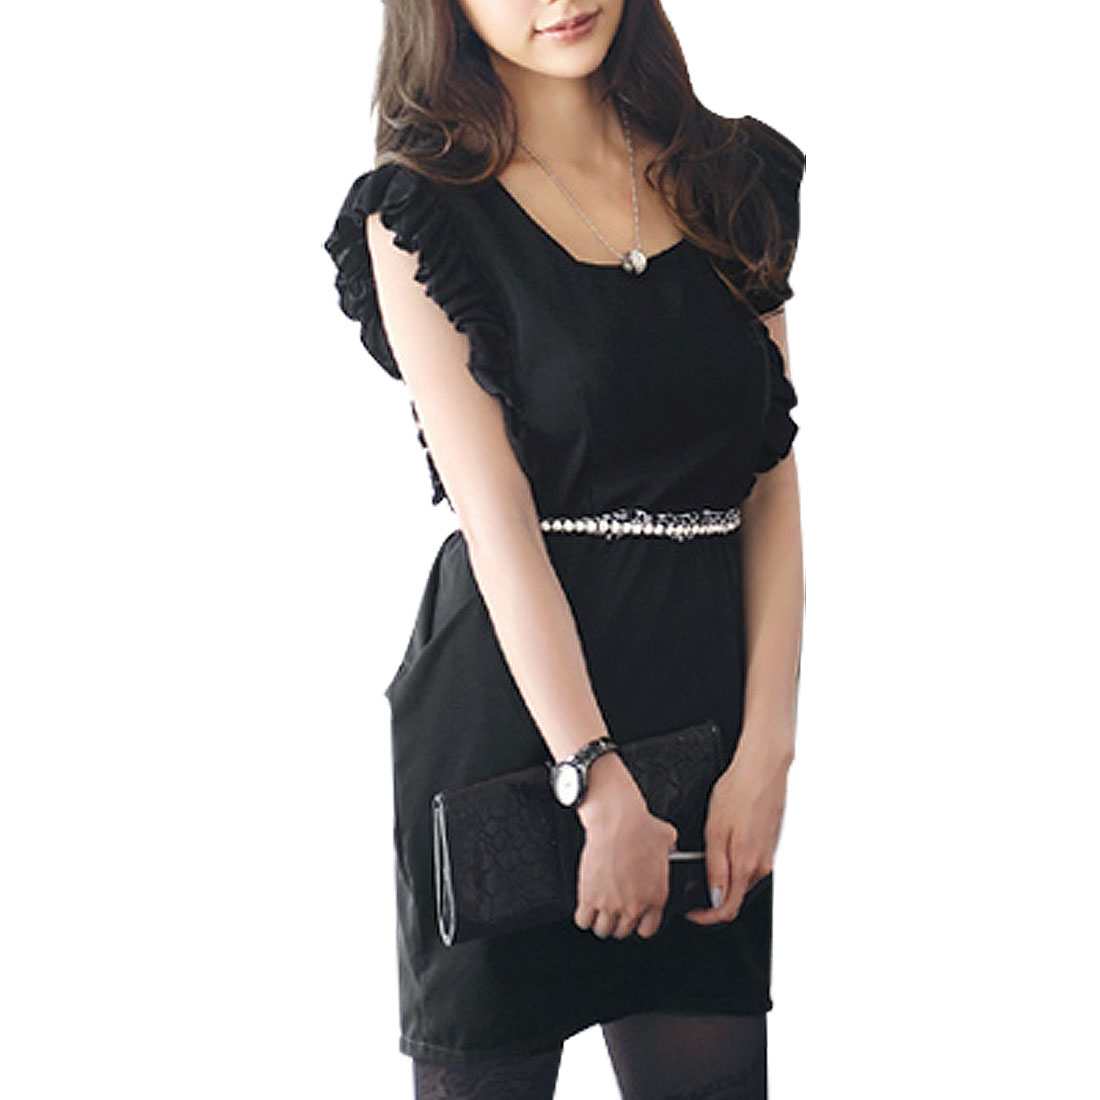 Women Sleeveless Square Neck Ruffle Trim Shift Dress Black XS